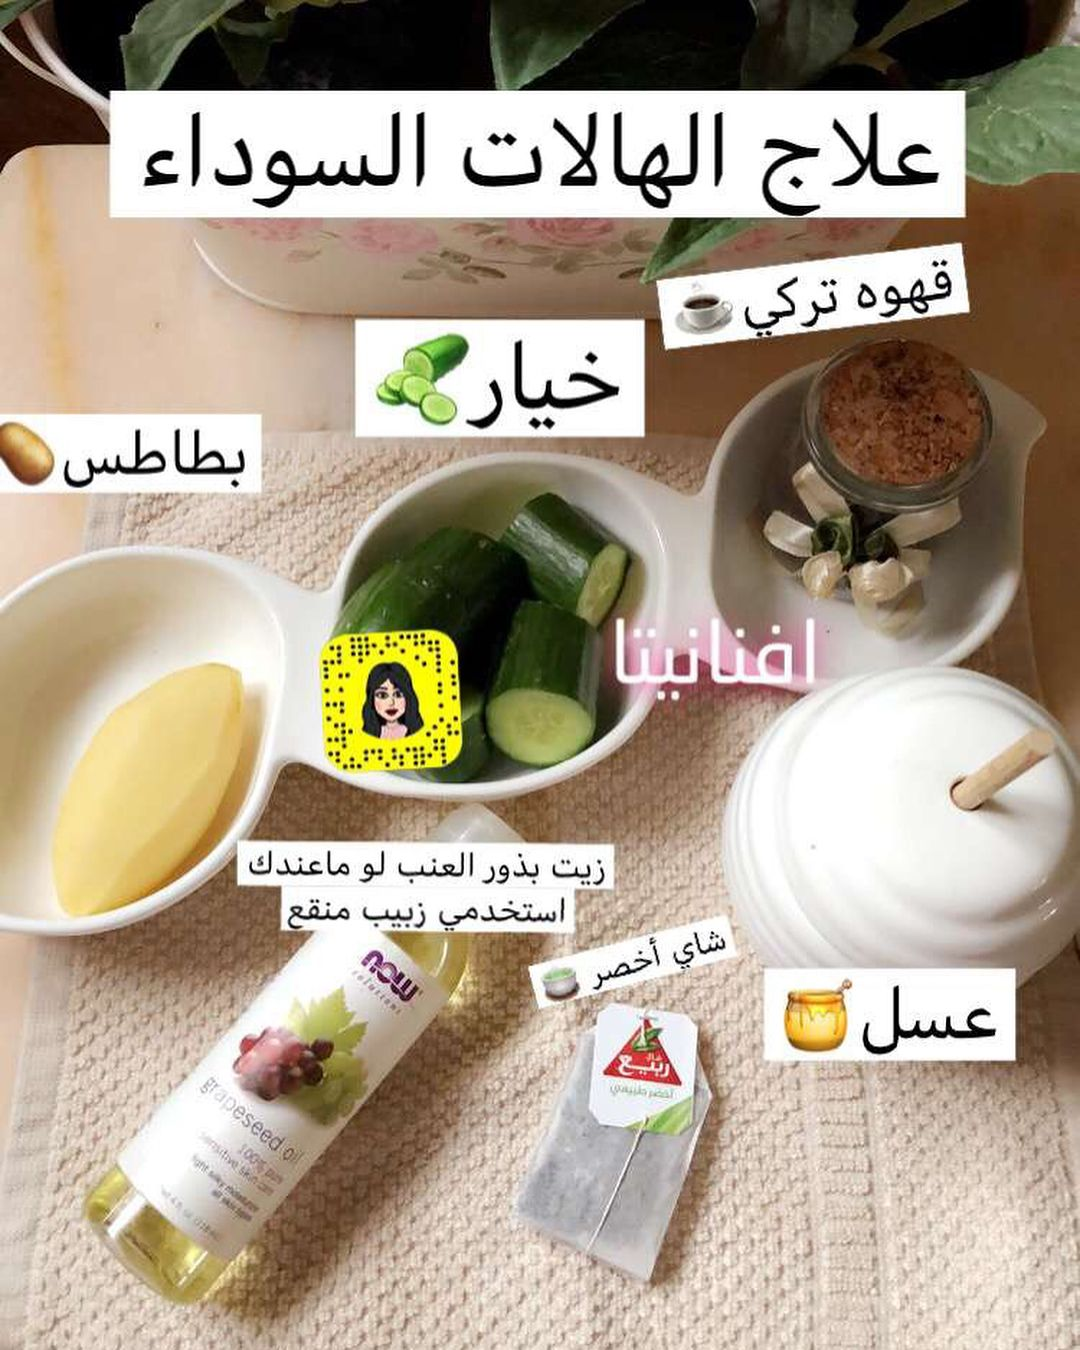 اخفاء الهالات الطريقه هاذي اتبعيهااقل من شهر وشوفي كيف تخف مااتمسى افنان اذا مااختفت بشك Beauty Skin Care Routine Skin Care Recipes Beauty Recipes Hair